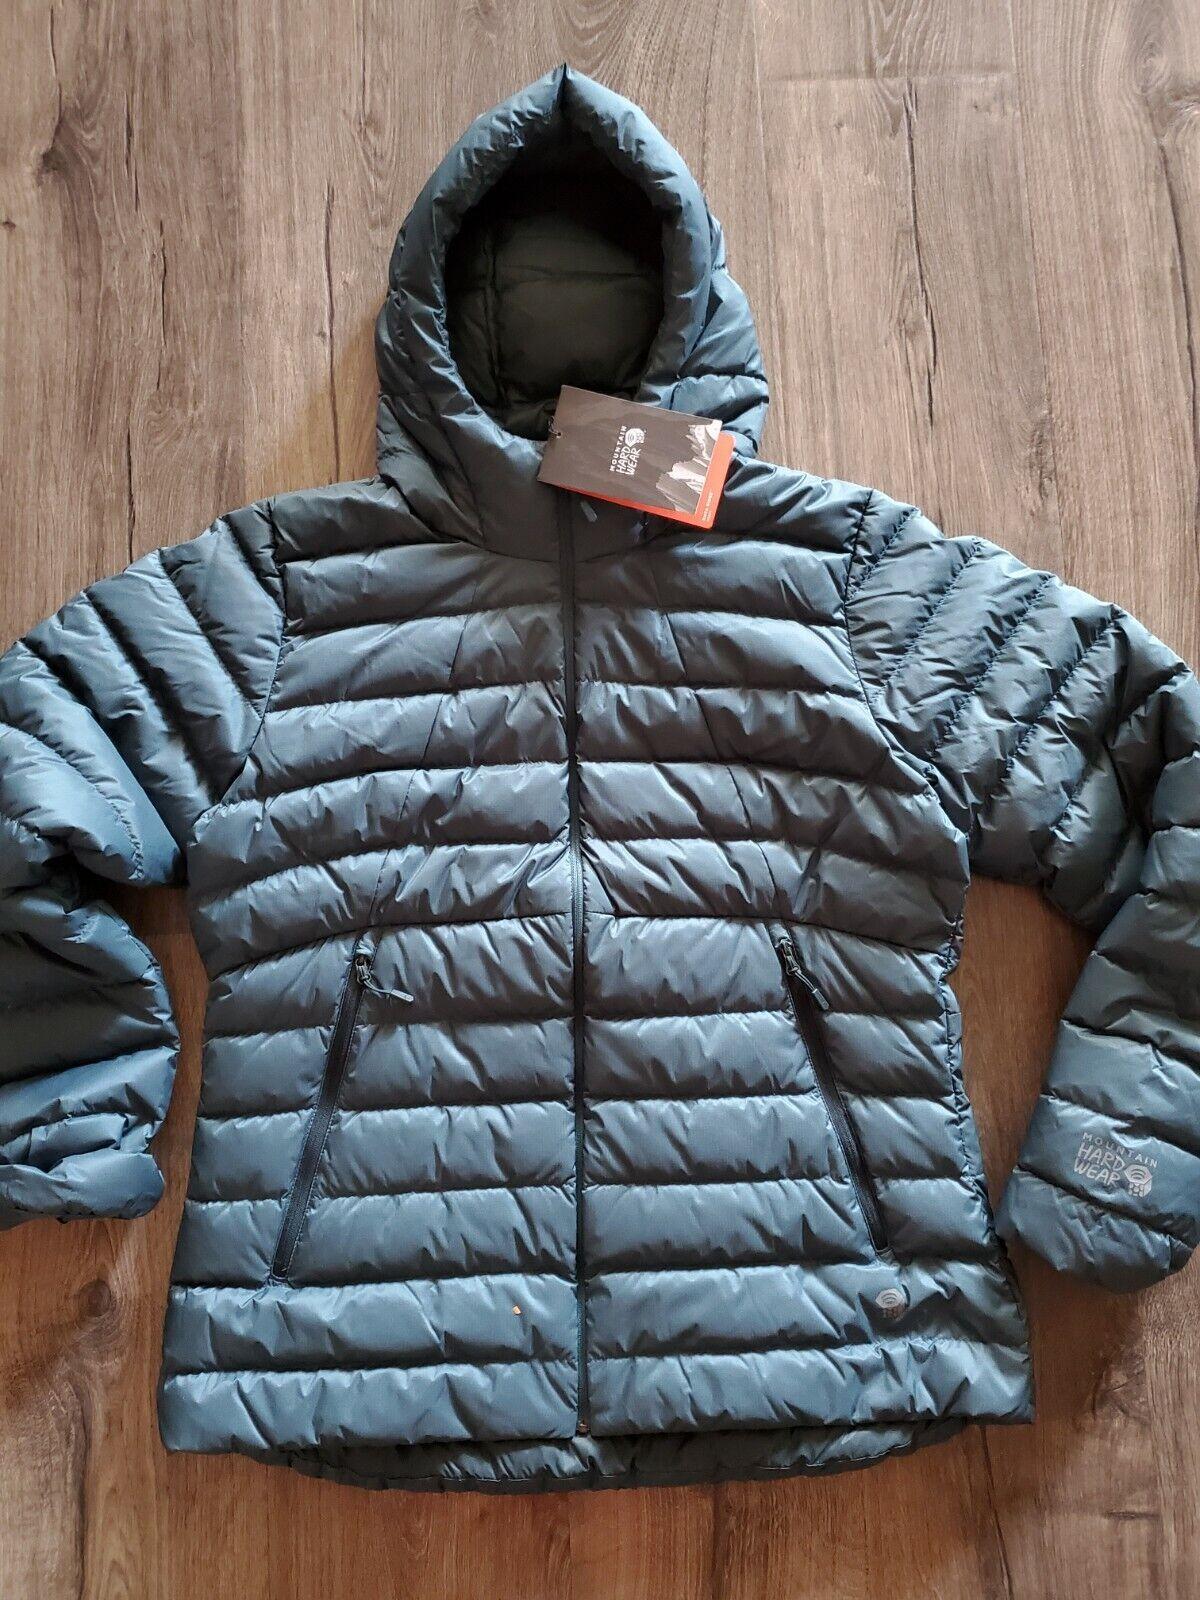 NWT Mountain Hardwear Rhea Ridge hoodie Down Jacket Women's Large 225